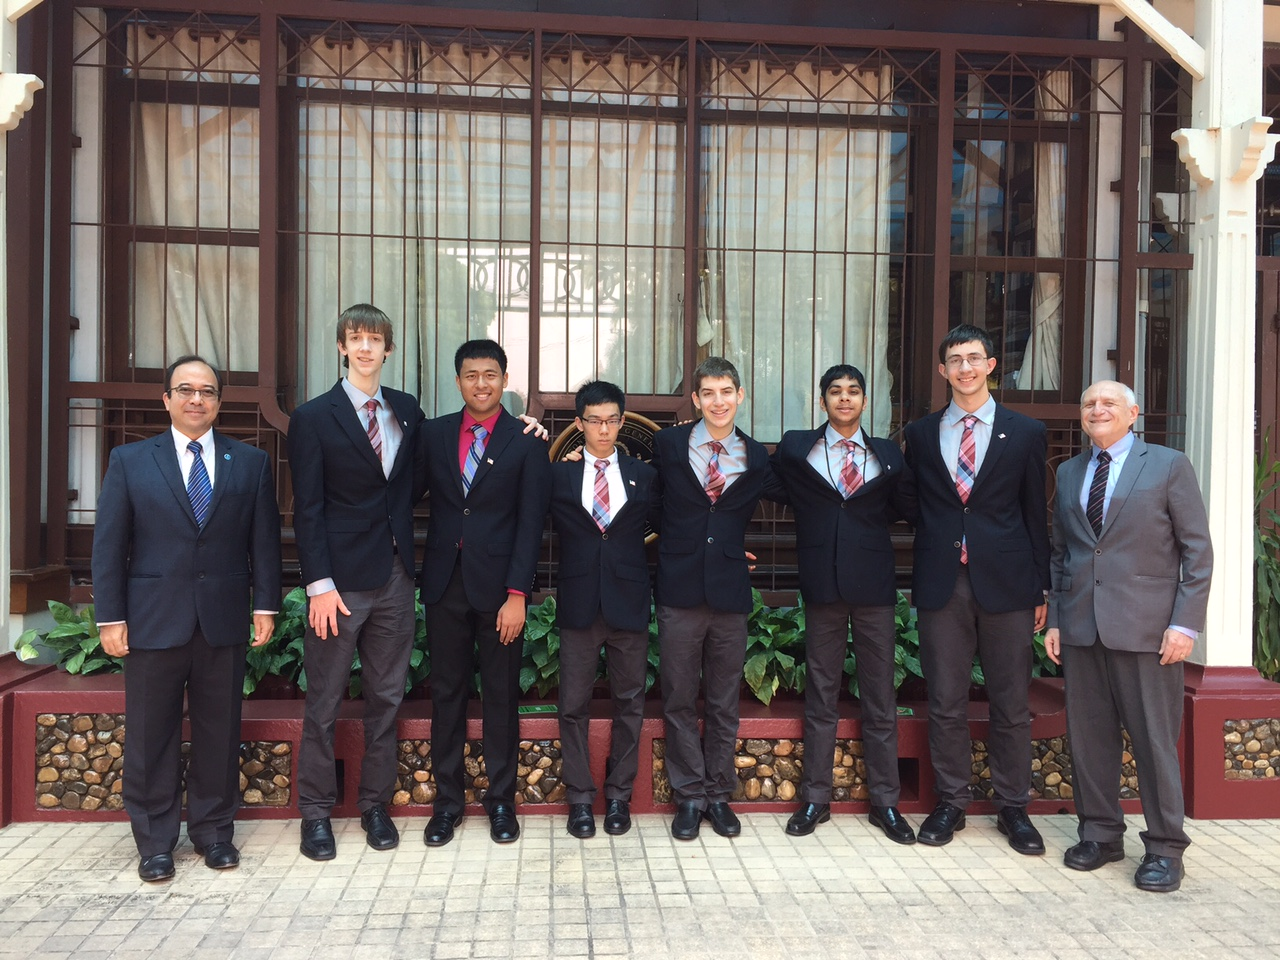 US maths olympiad team photo